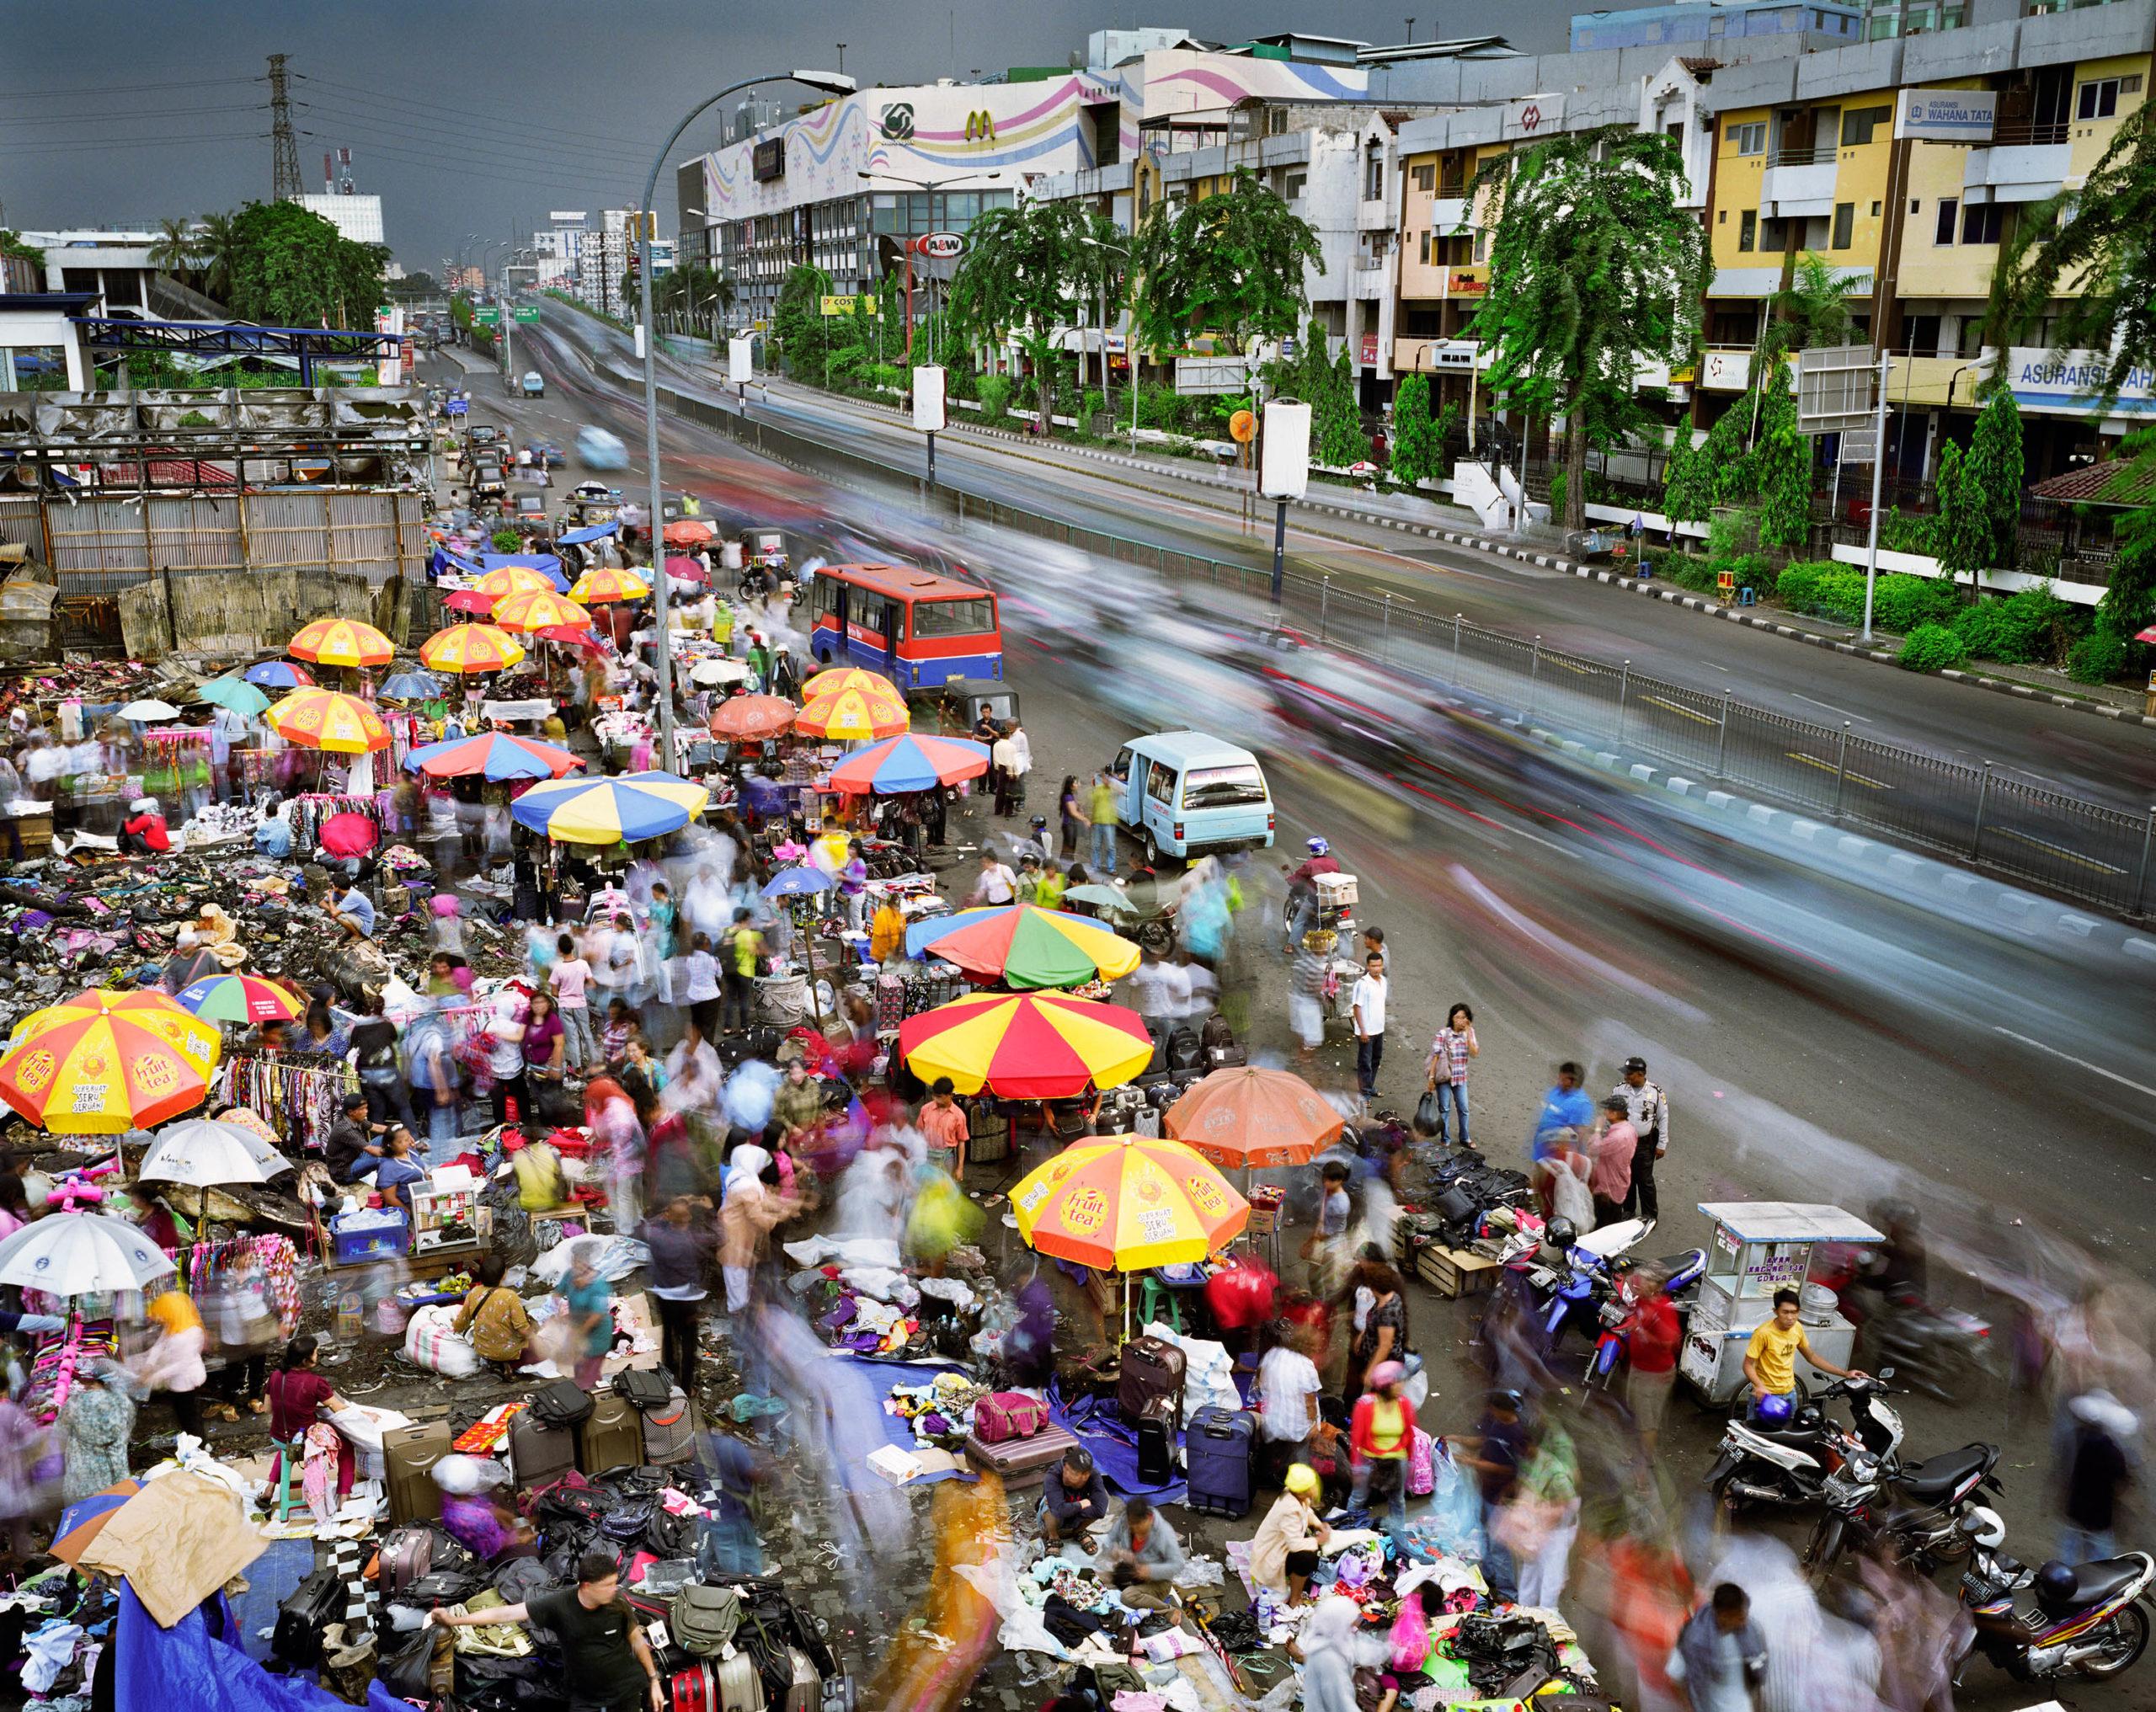 Jalan Pasar Senen, Senen, Jakarta, Indonesia,